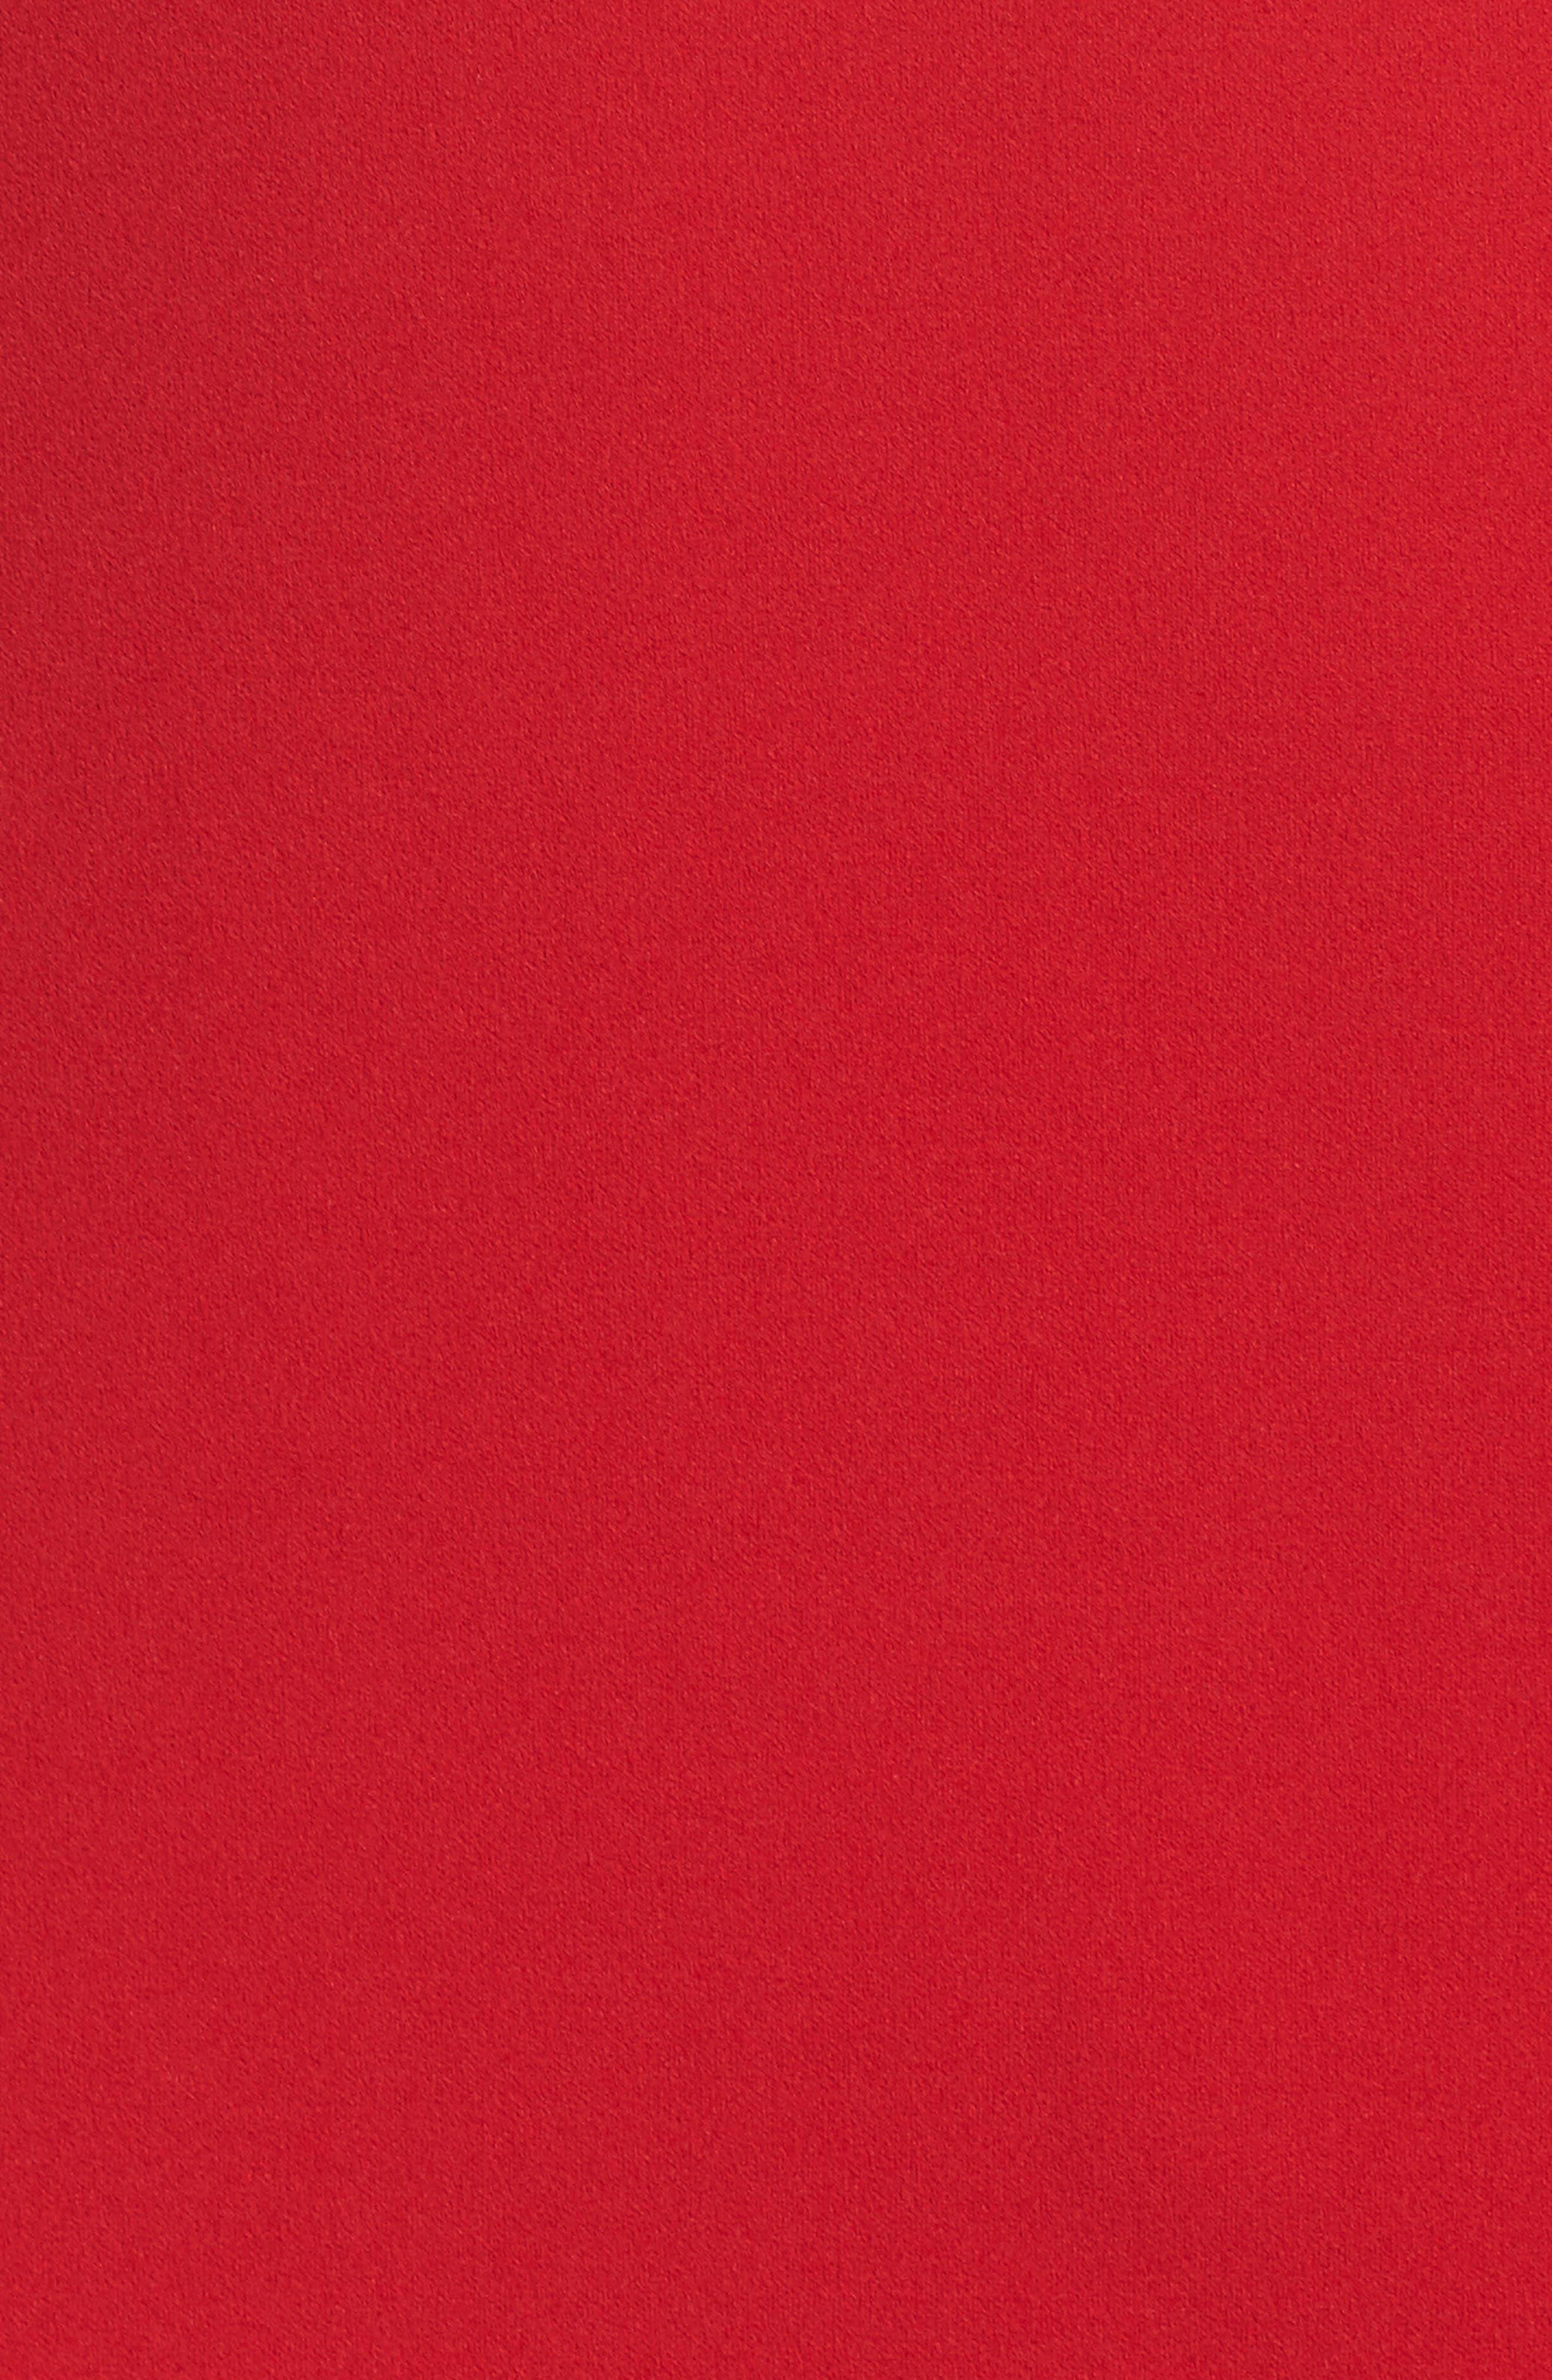 Ruffle One-Shoulder Scuba Body-Con Dress,                             Alternate thumbnail 5, color,                             610